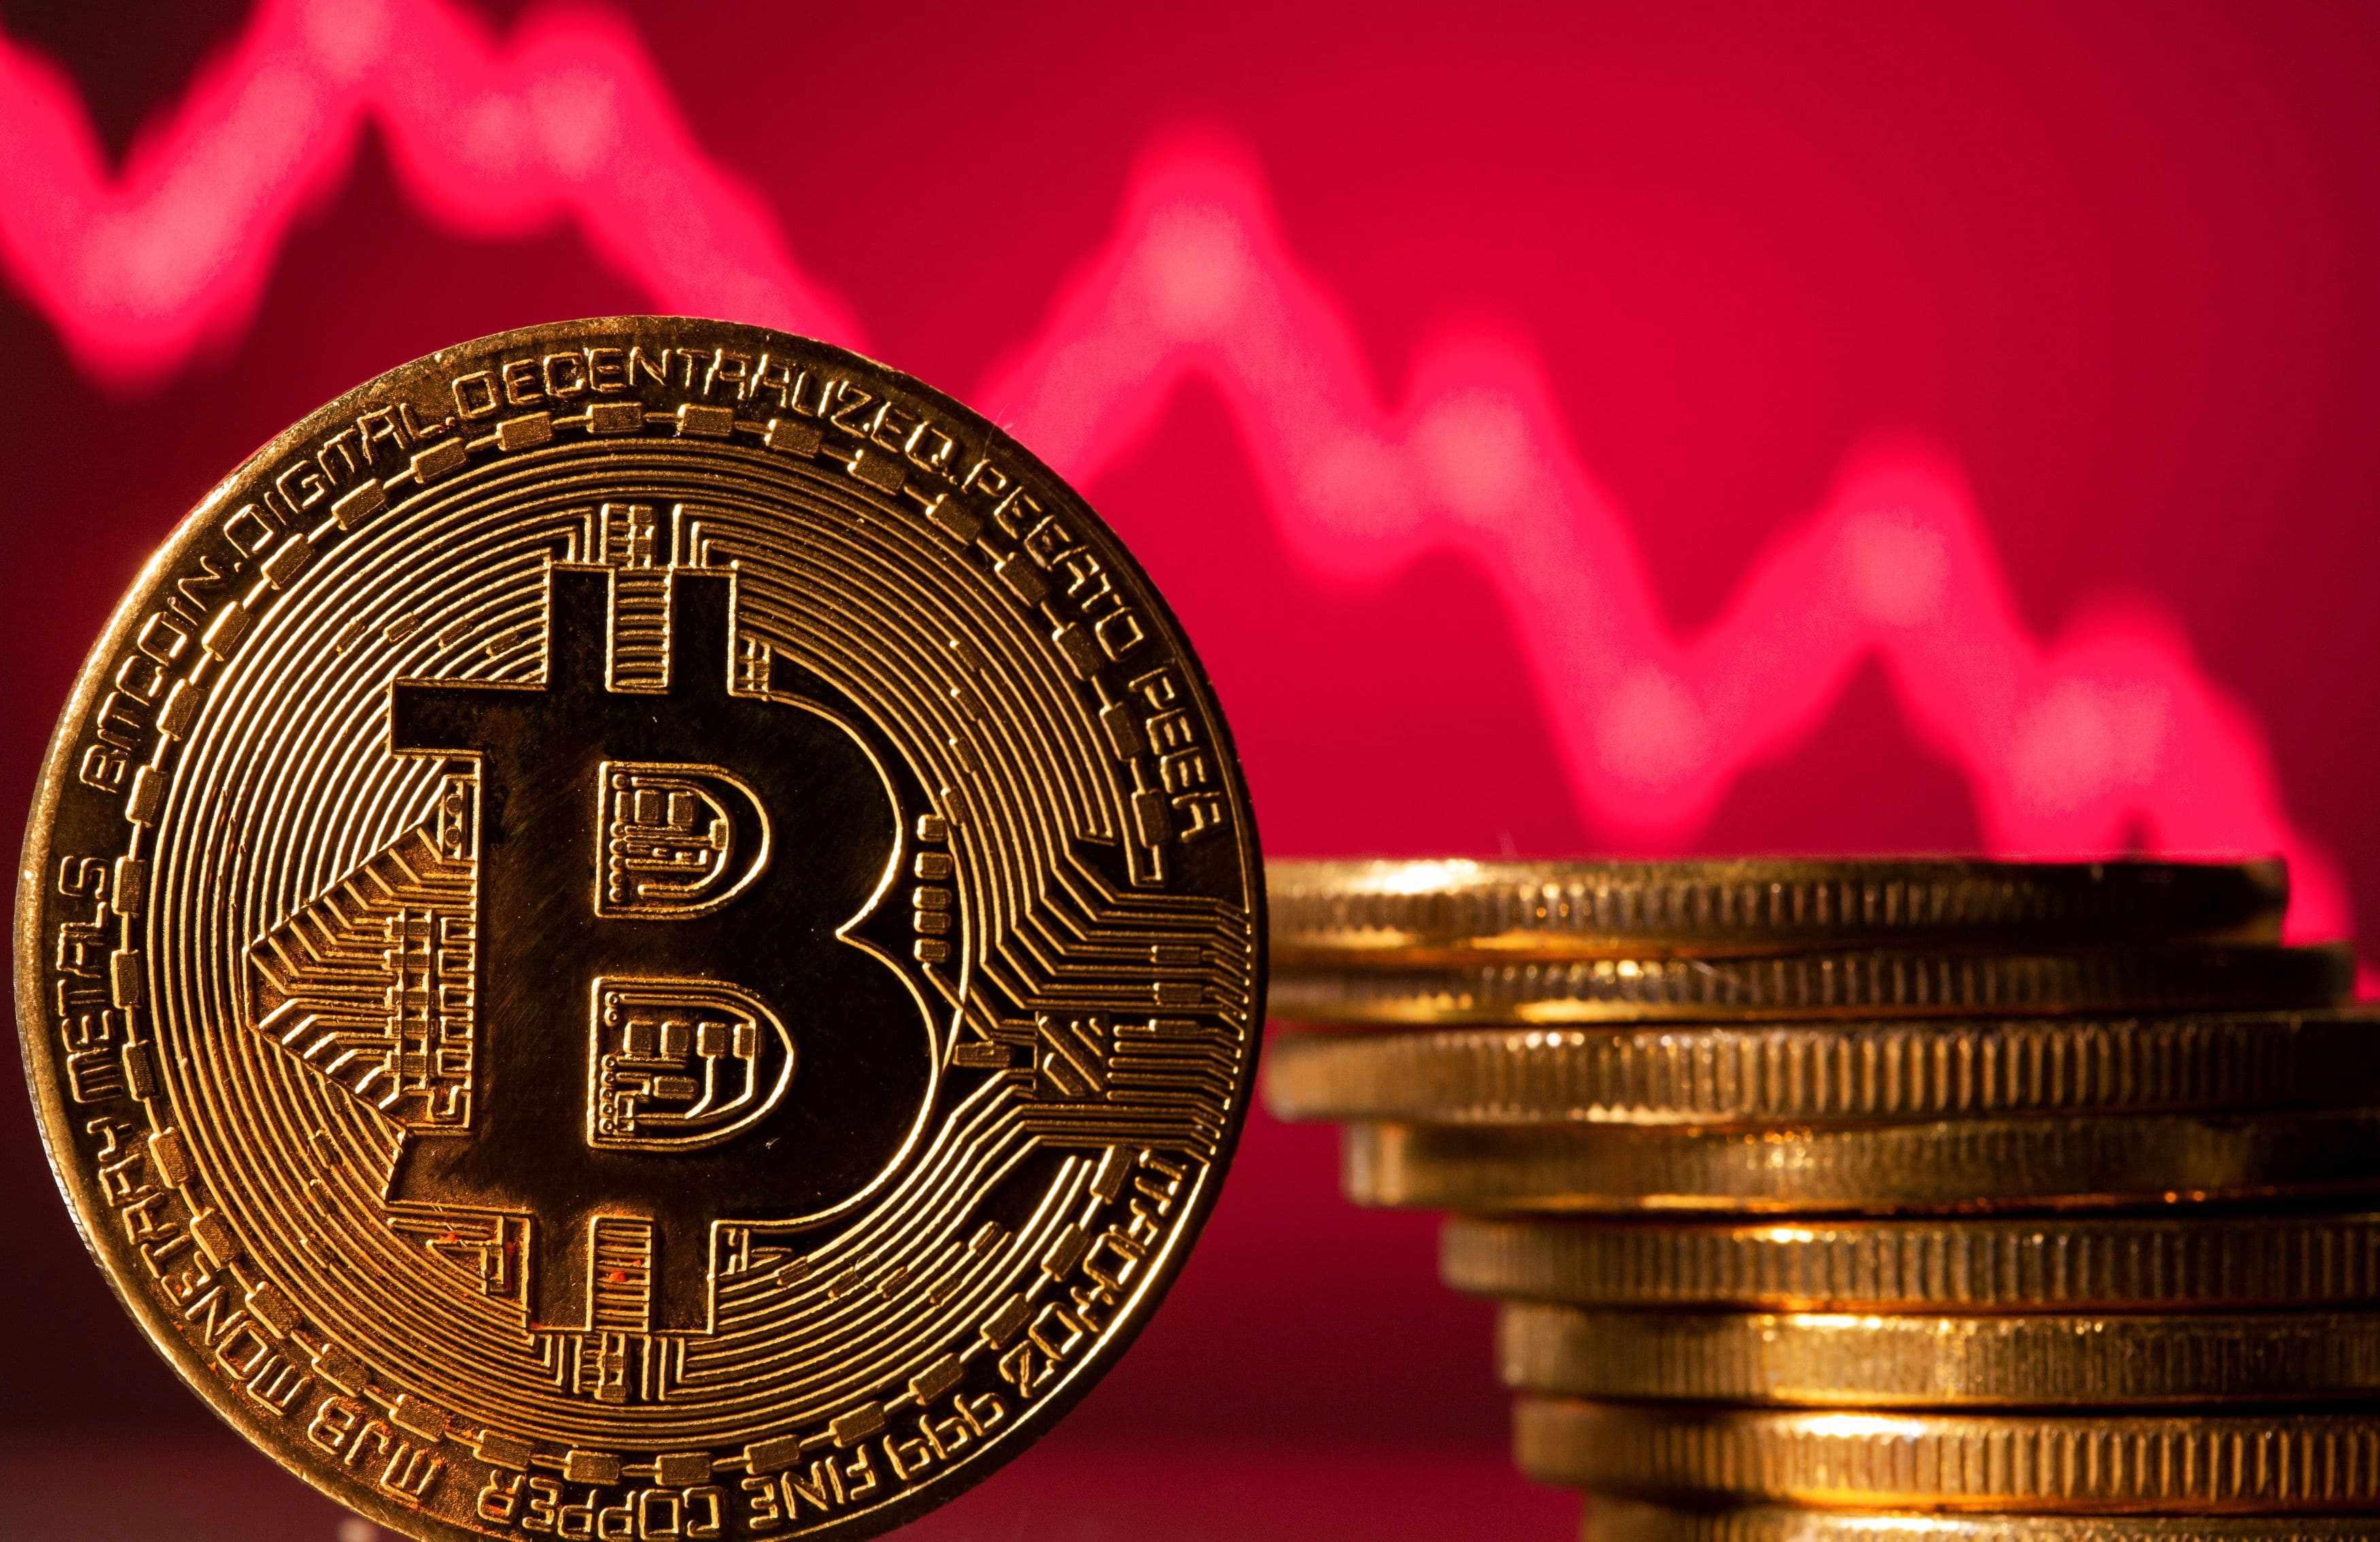 jpmorgan investors bear market bitcoin